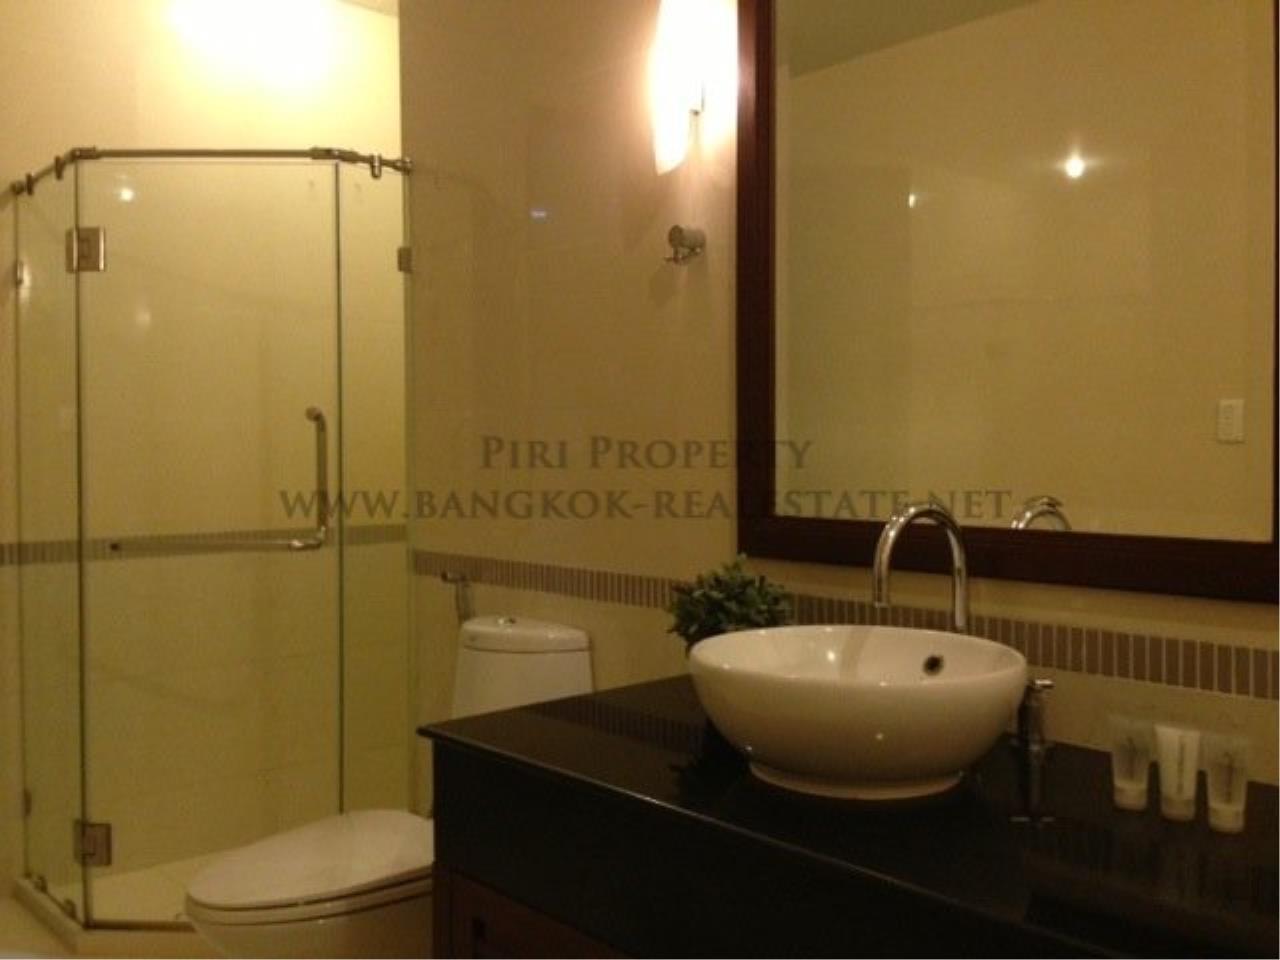 Piri Property Agency's Nice 1 Bedroom Condo near Ratchtewi BTS Station - 58 SQM - 30K 9